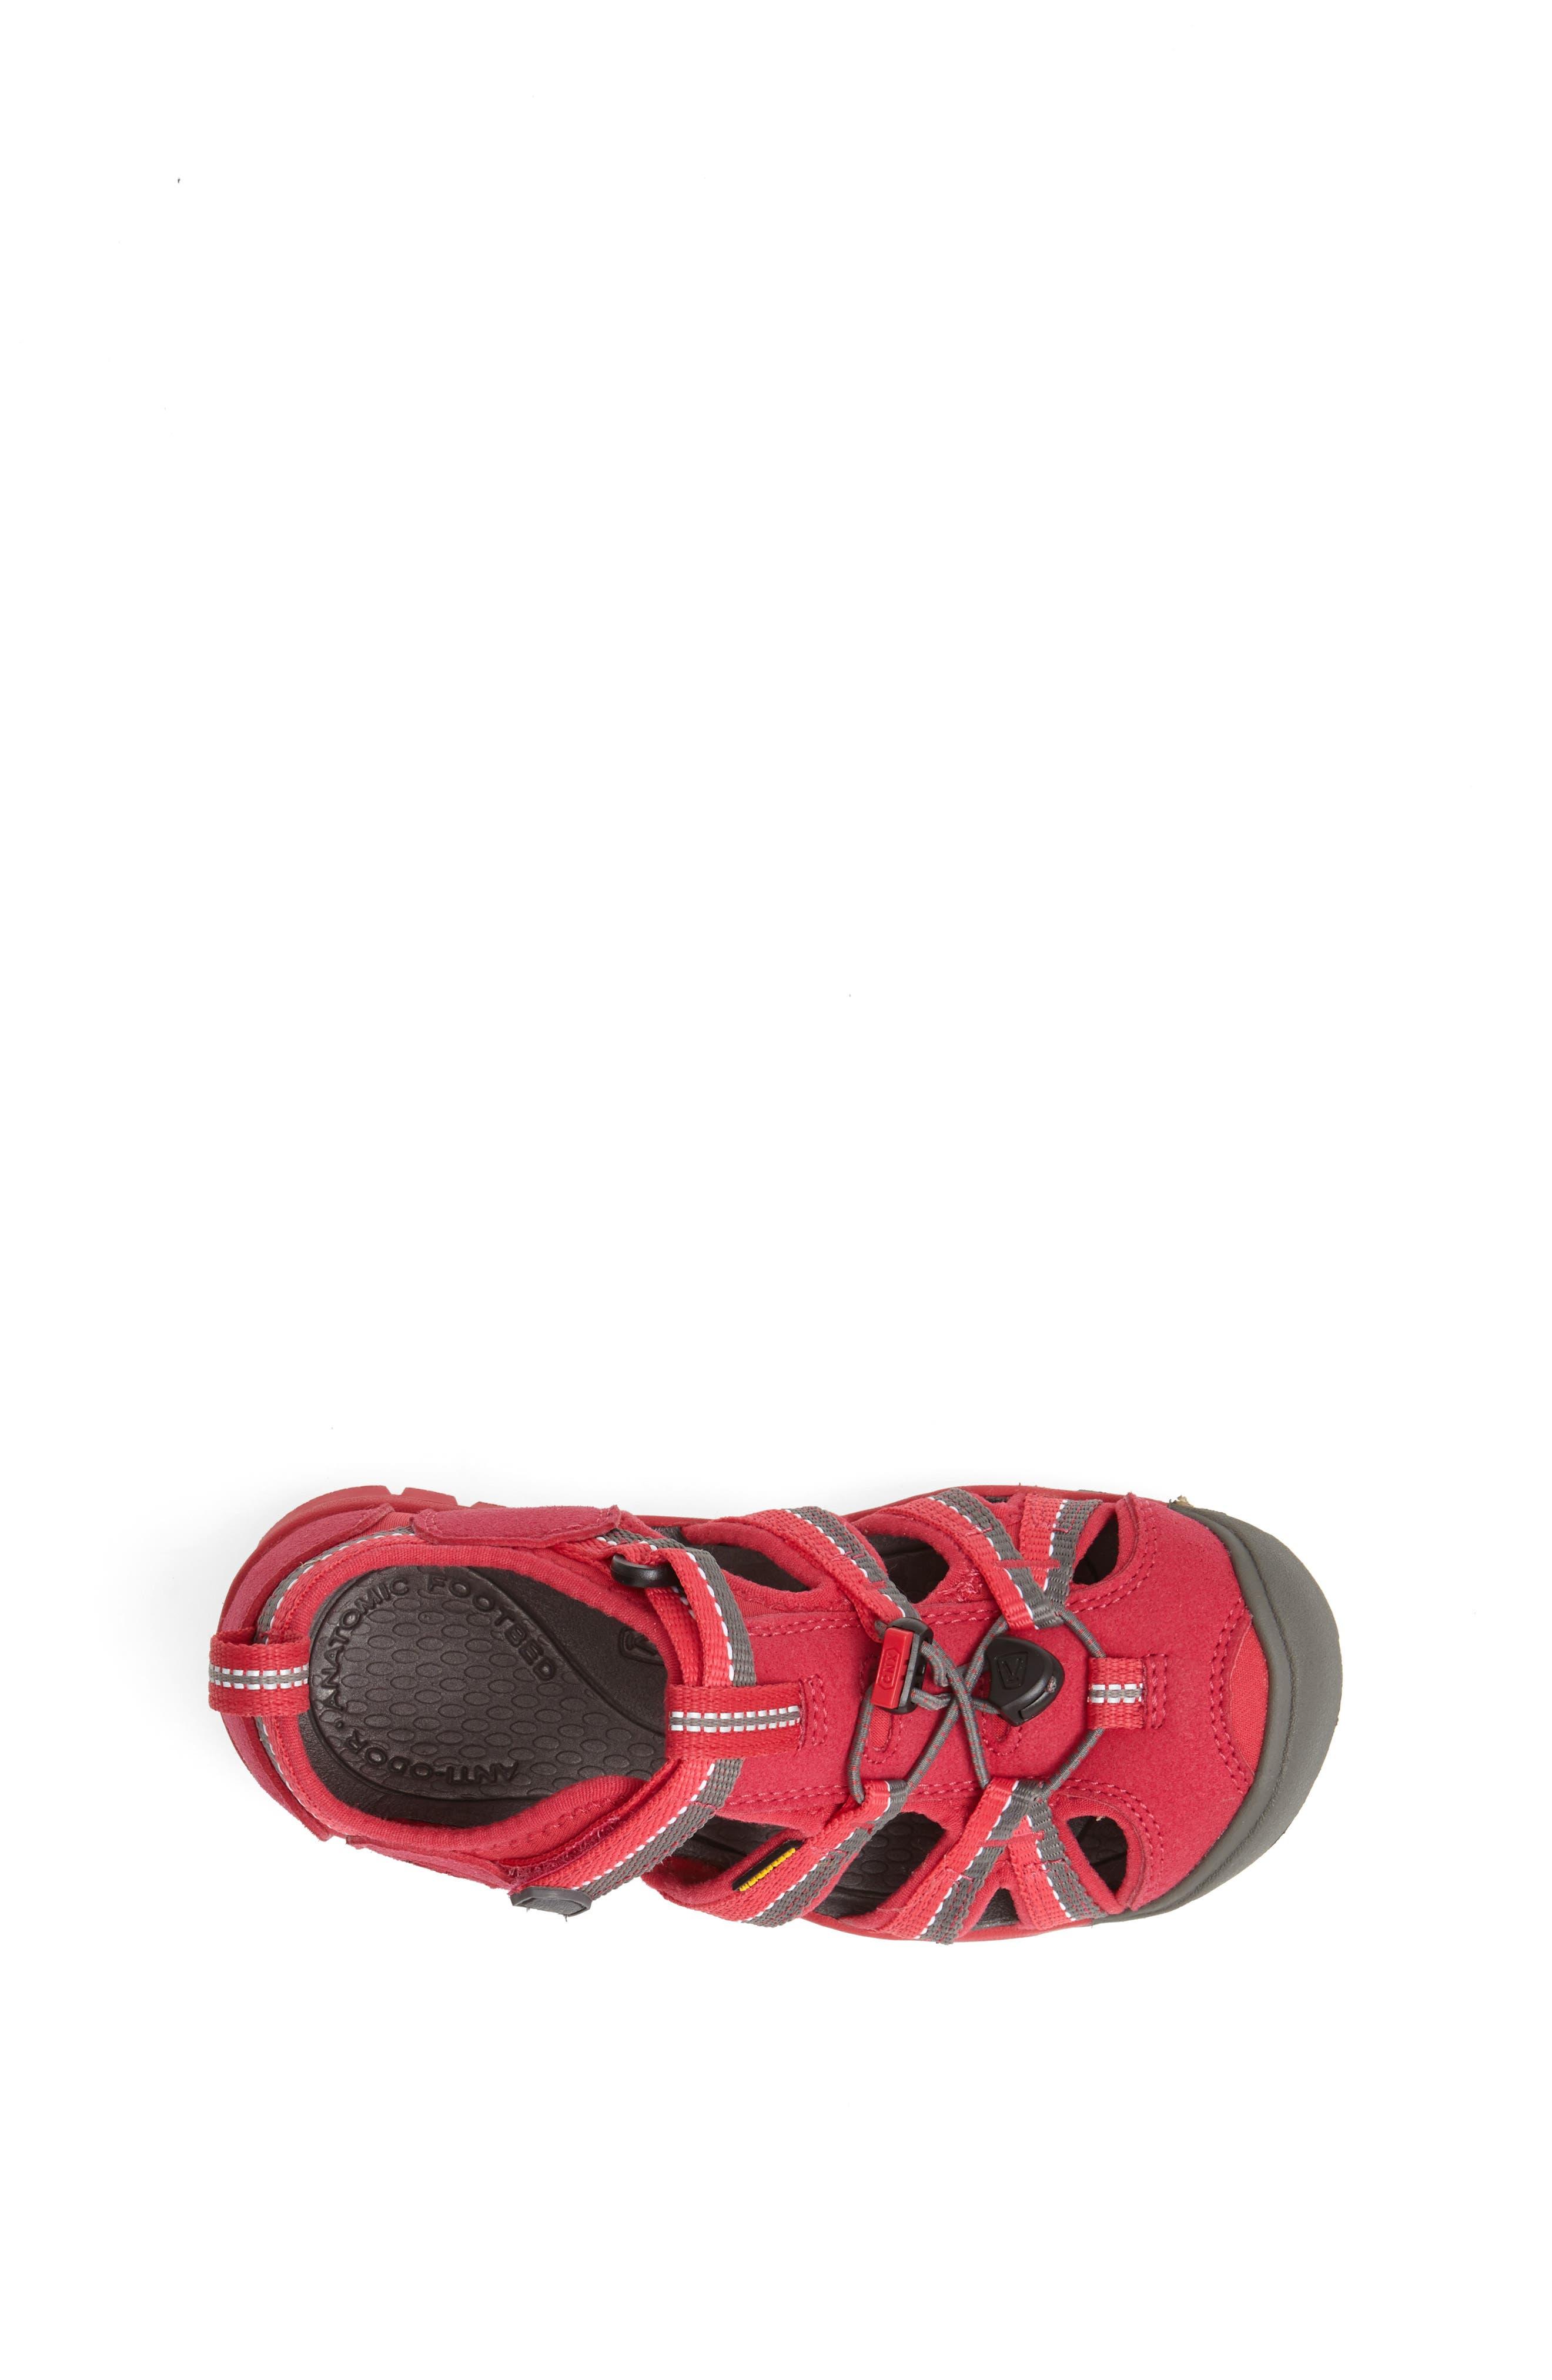 ,                             'Seacamp II' Water Friendly Sandal,                             Alternate thumbnail 235, color,                             600